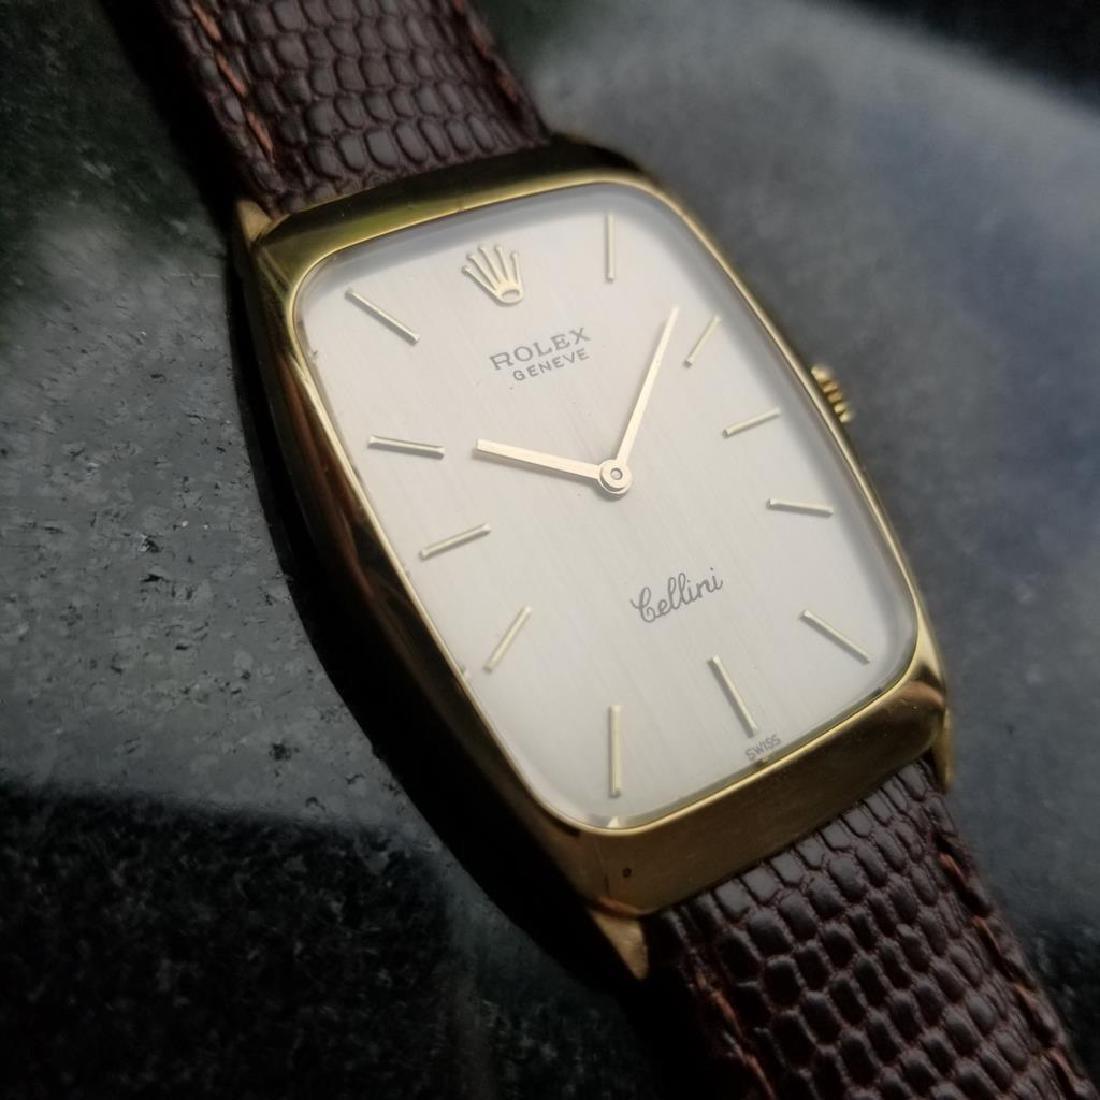 ROLEX Men's 18K Gold Cellini 4136 Hand-Wind Dress Watch - 3